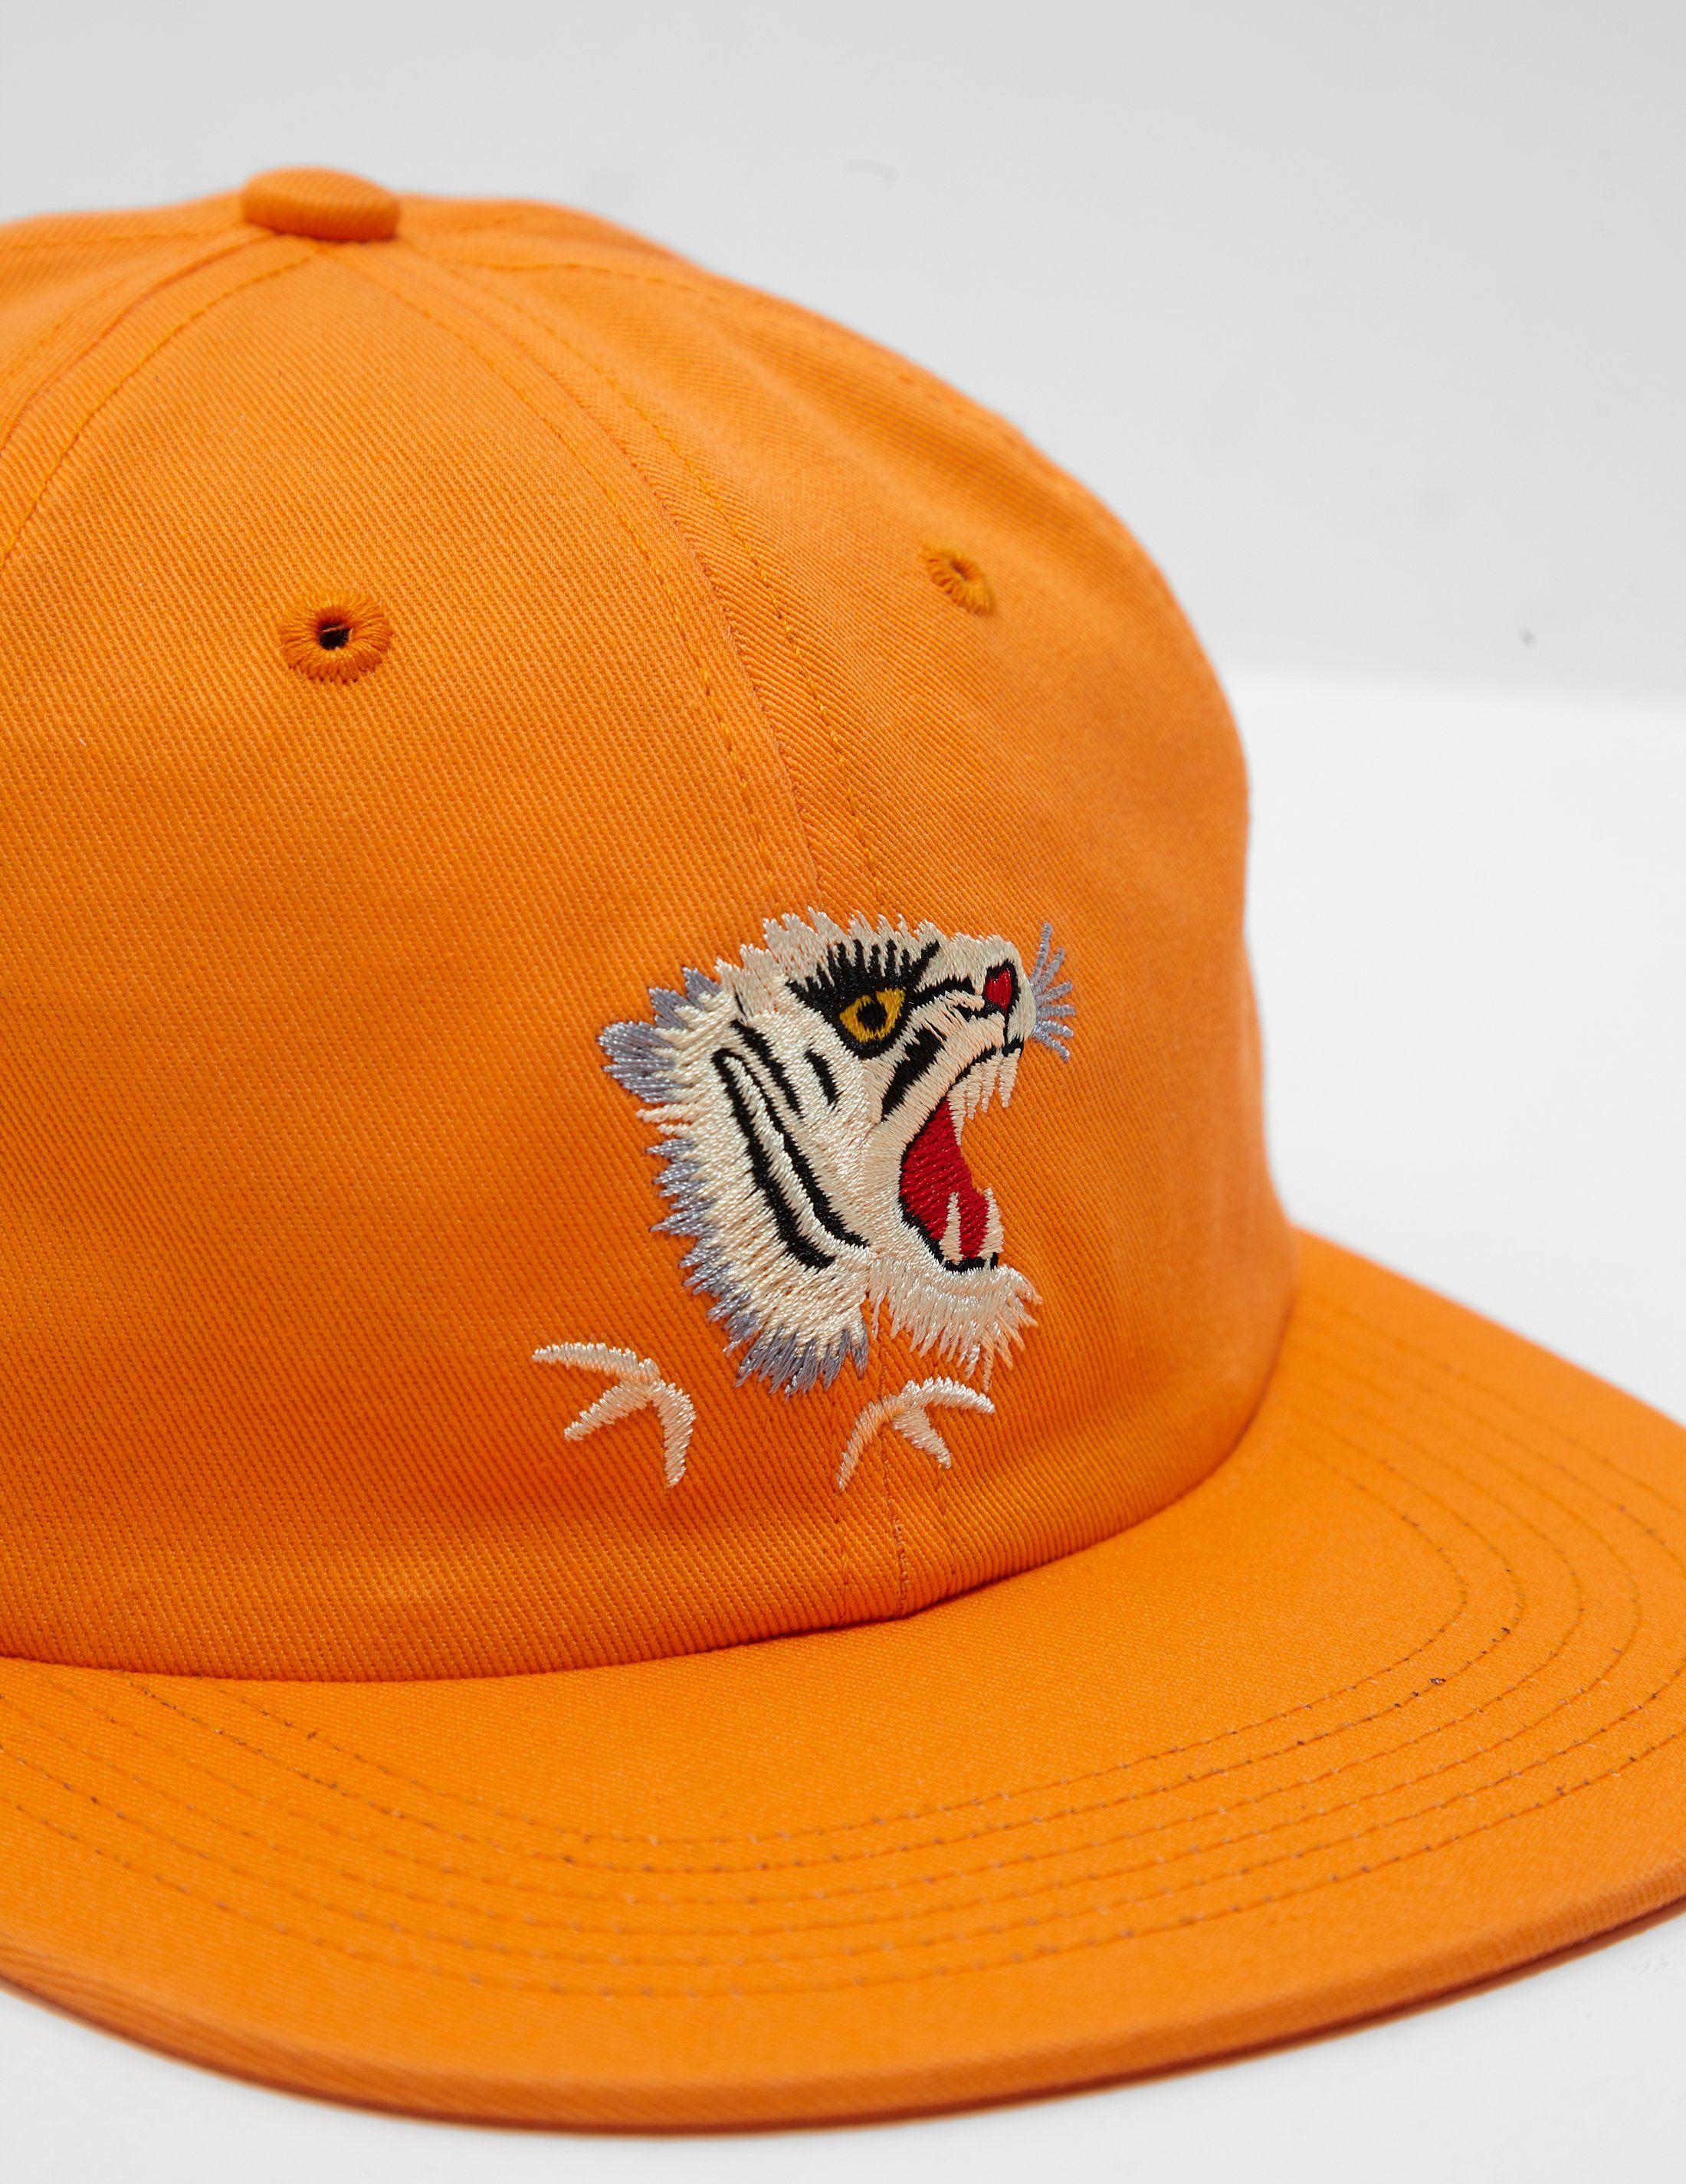 Maharishi Tiger Cap - Online Exclusive